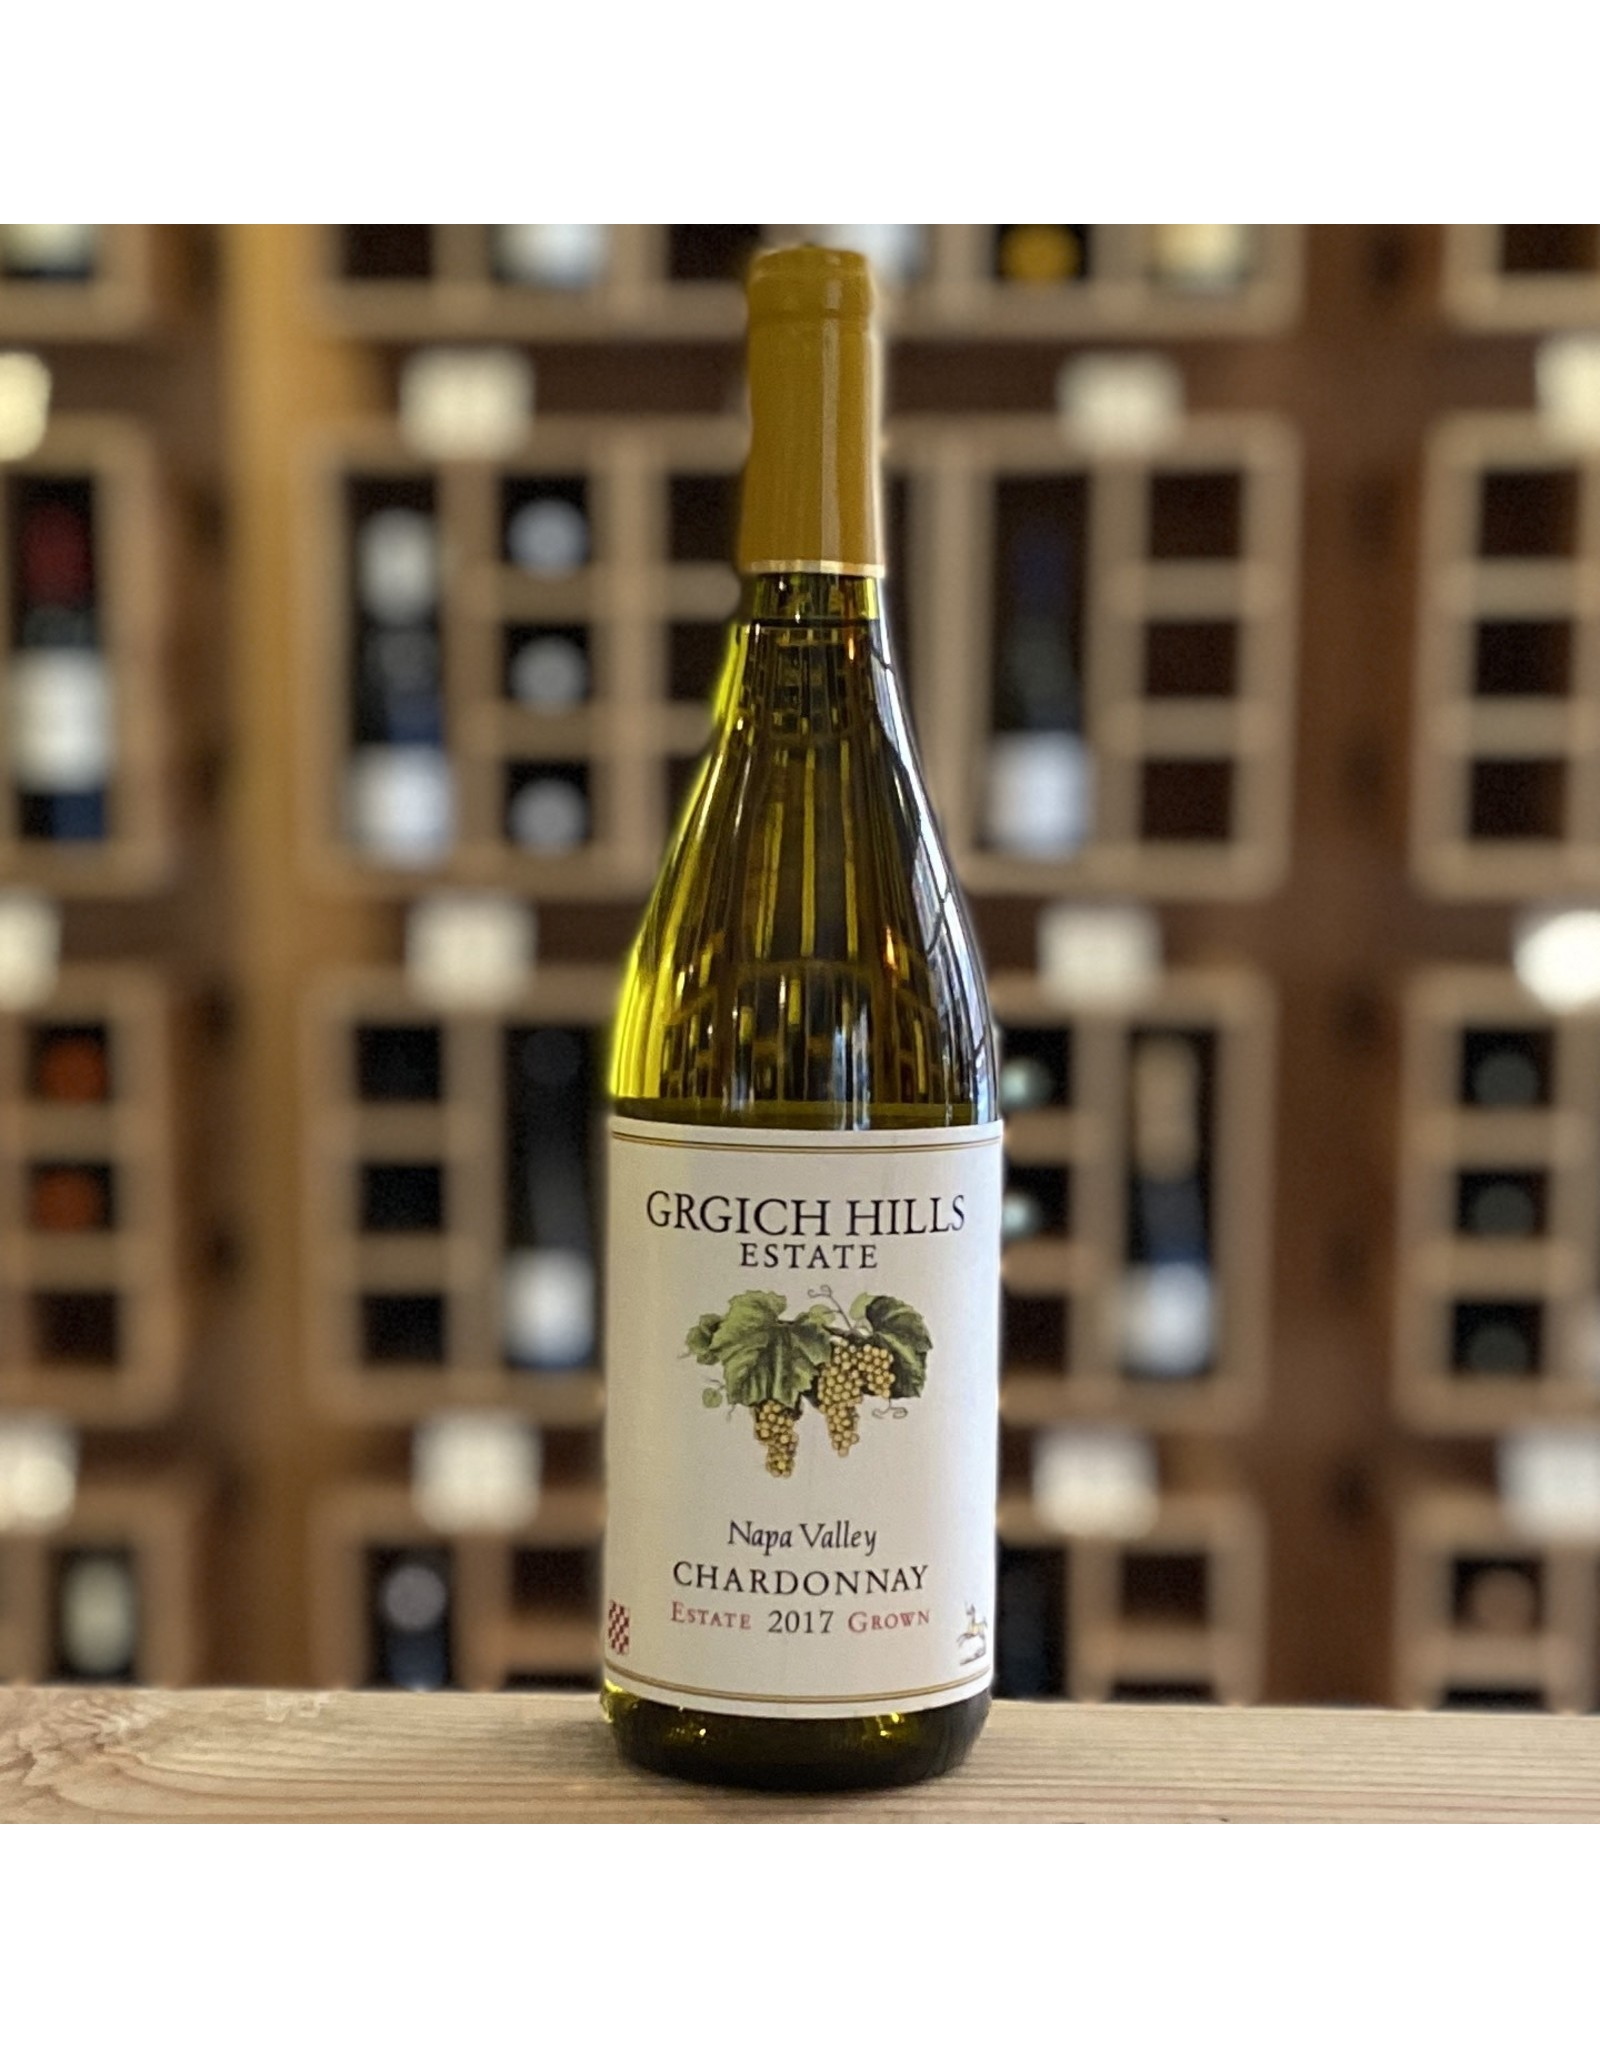 Napa Valley Grgich Hills Chardonnay - Napa 2016 750ml